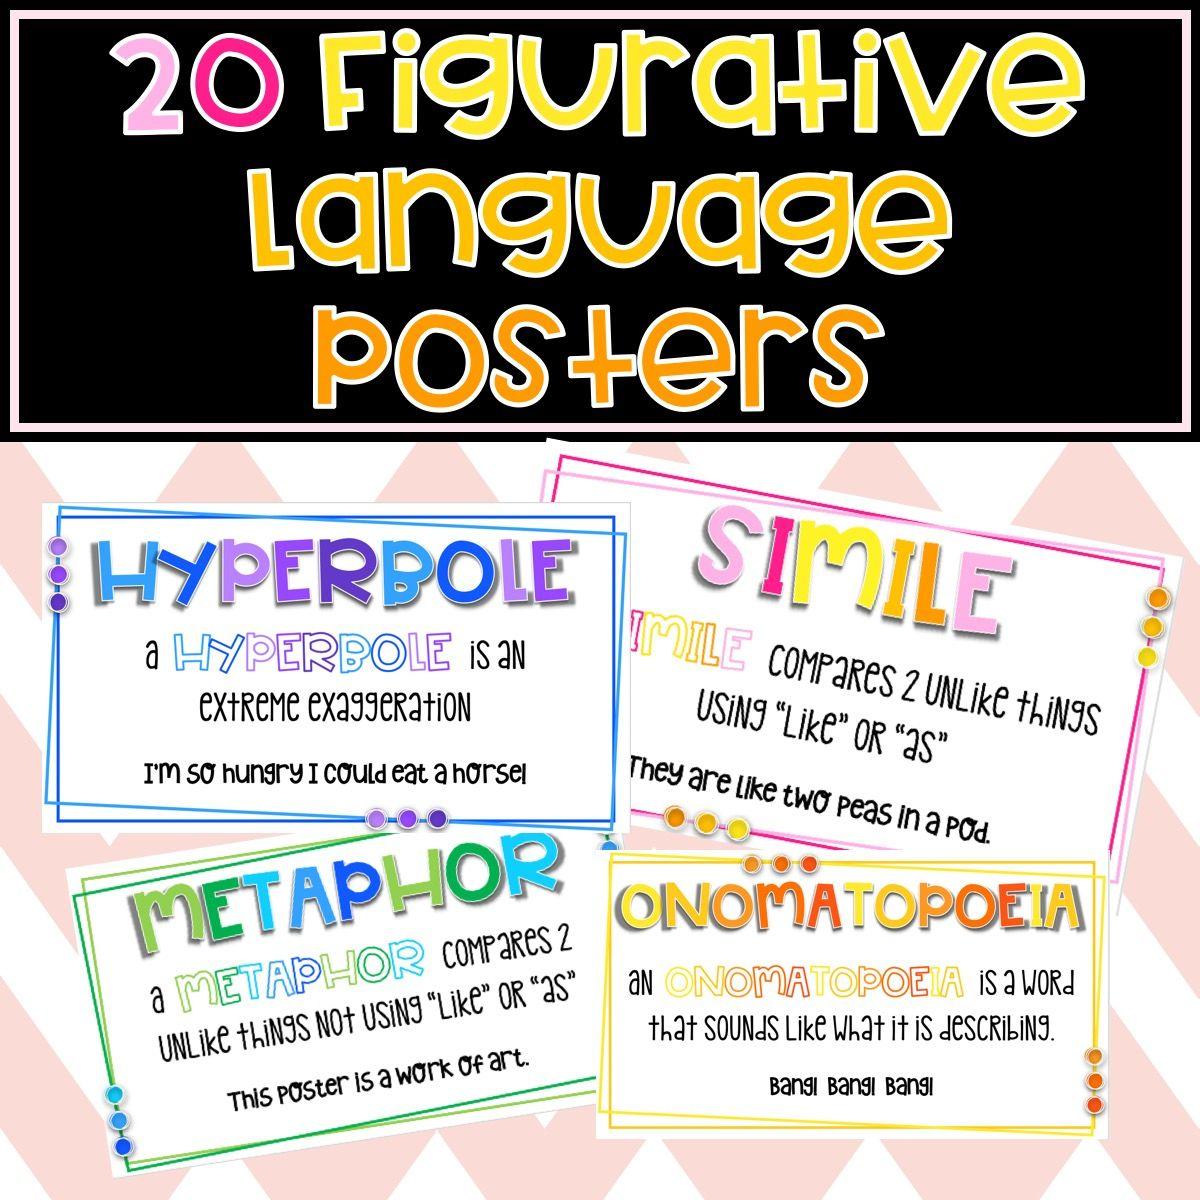 20 Figuartive Language Posters